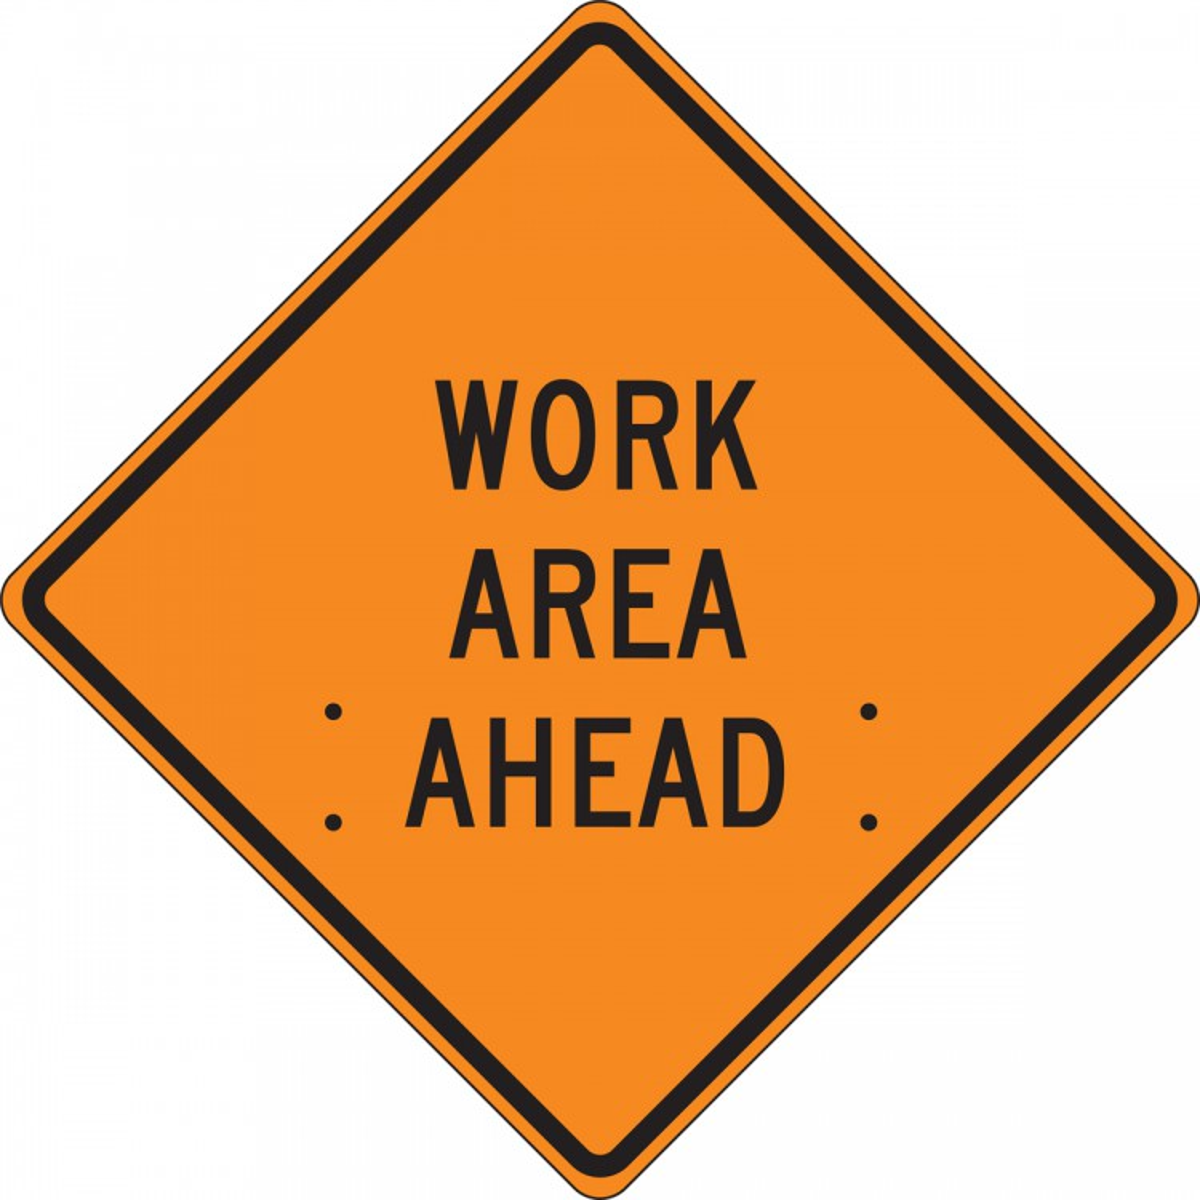 WORK AREA AHEAD